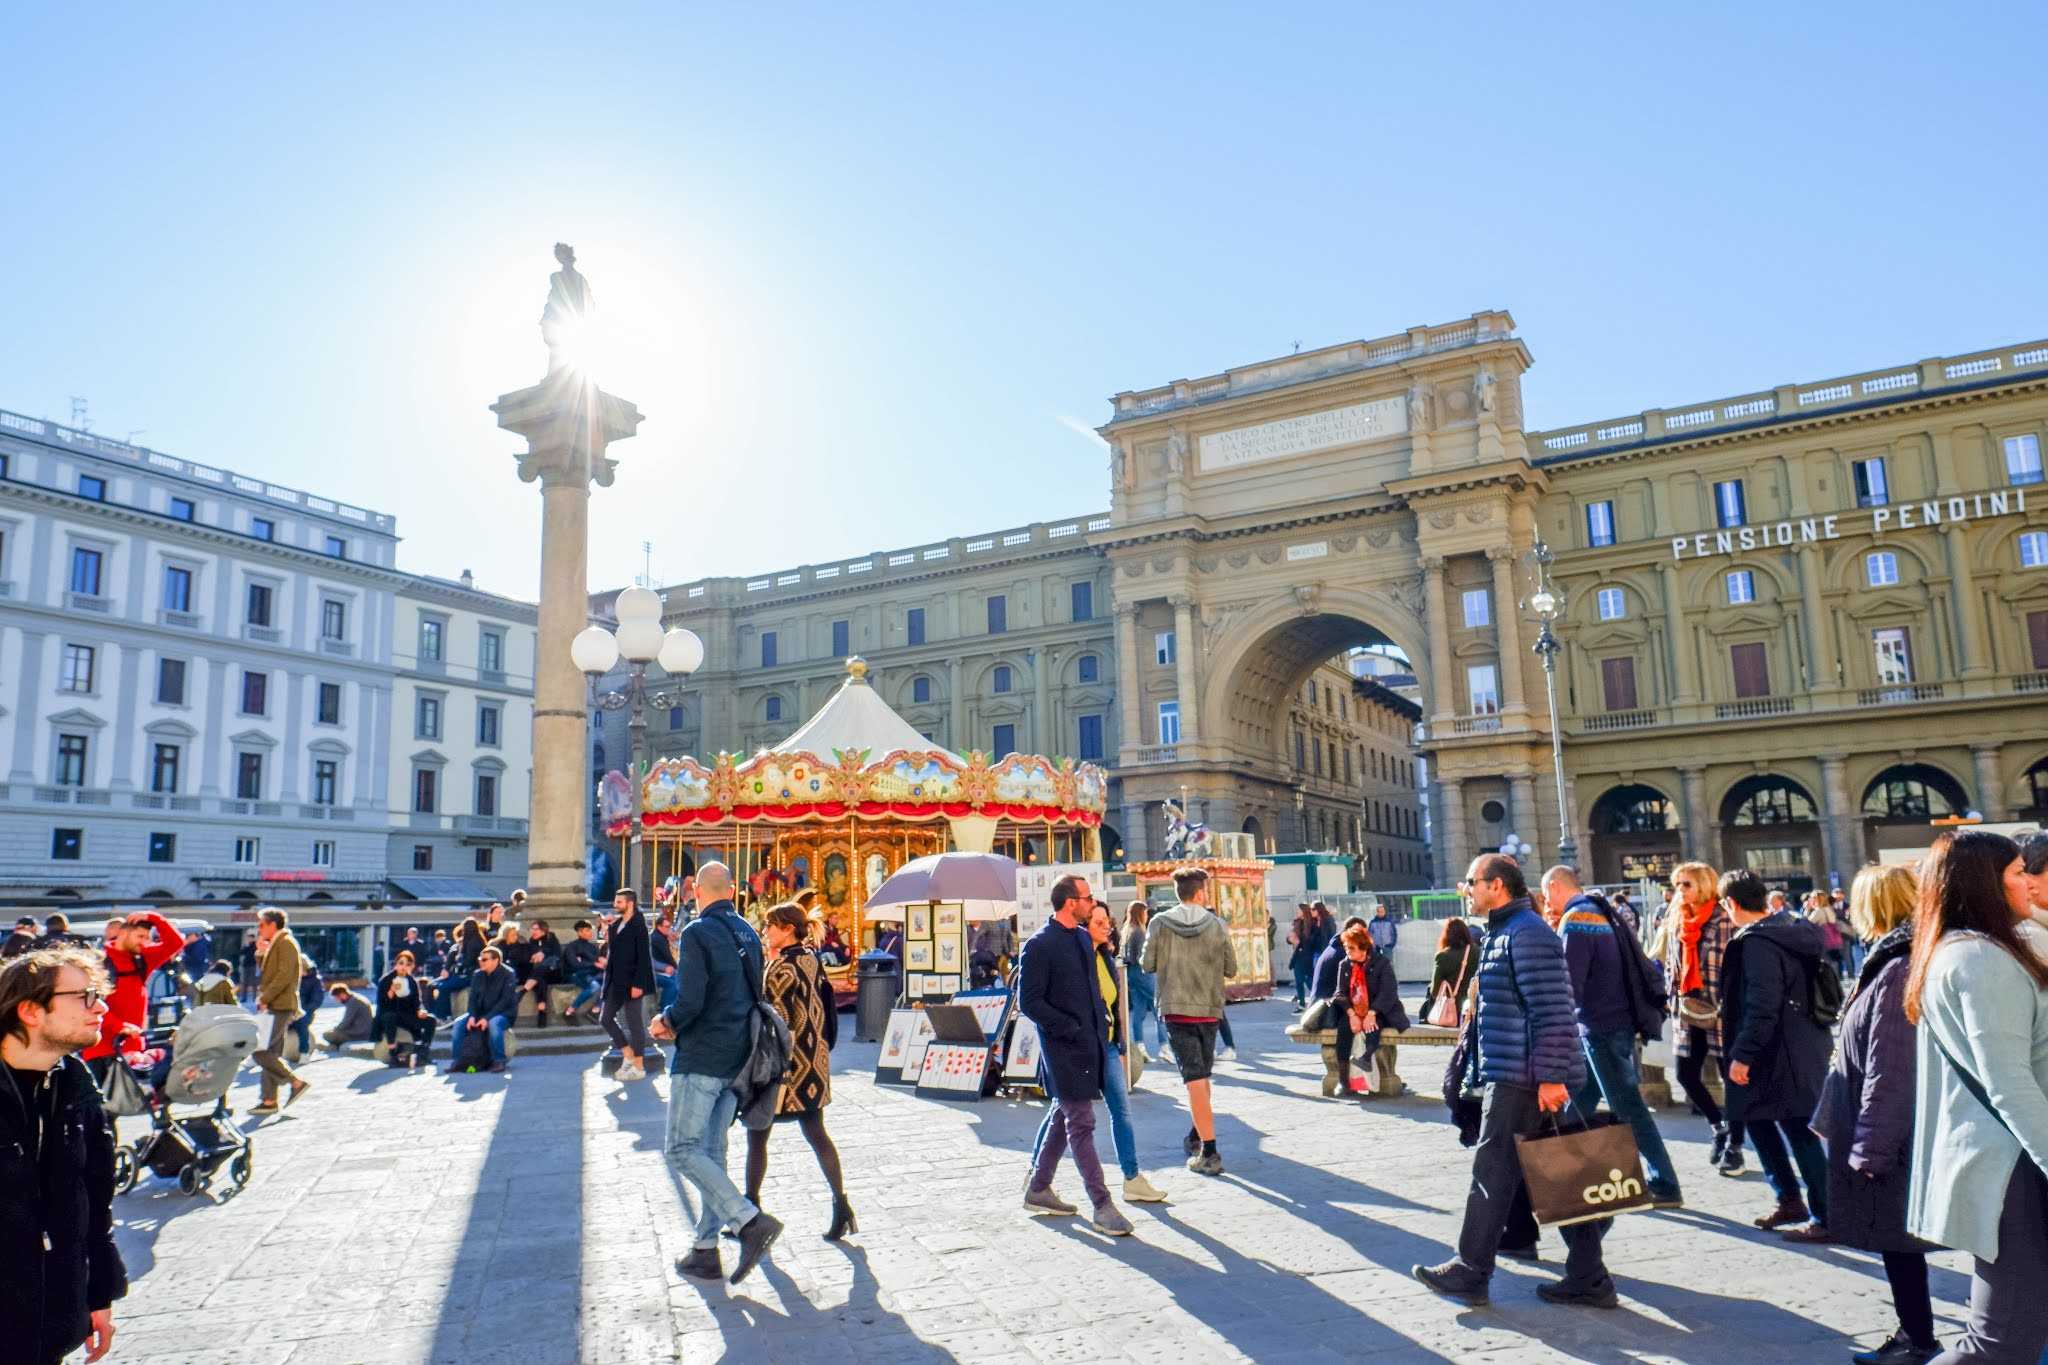 Piazza della Repubblica, Florence Italy, carousel florence italy, 19th century building, italian architecture